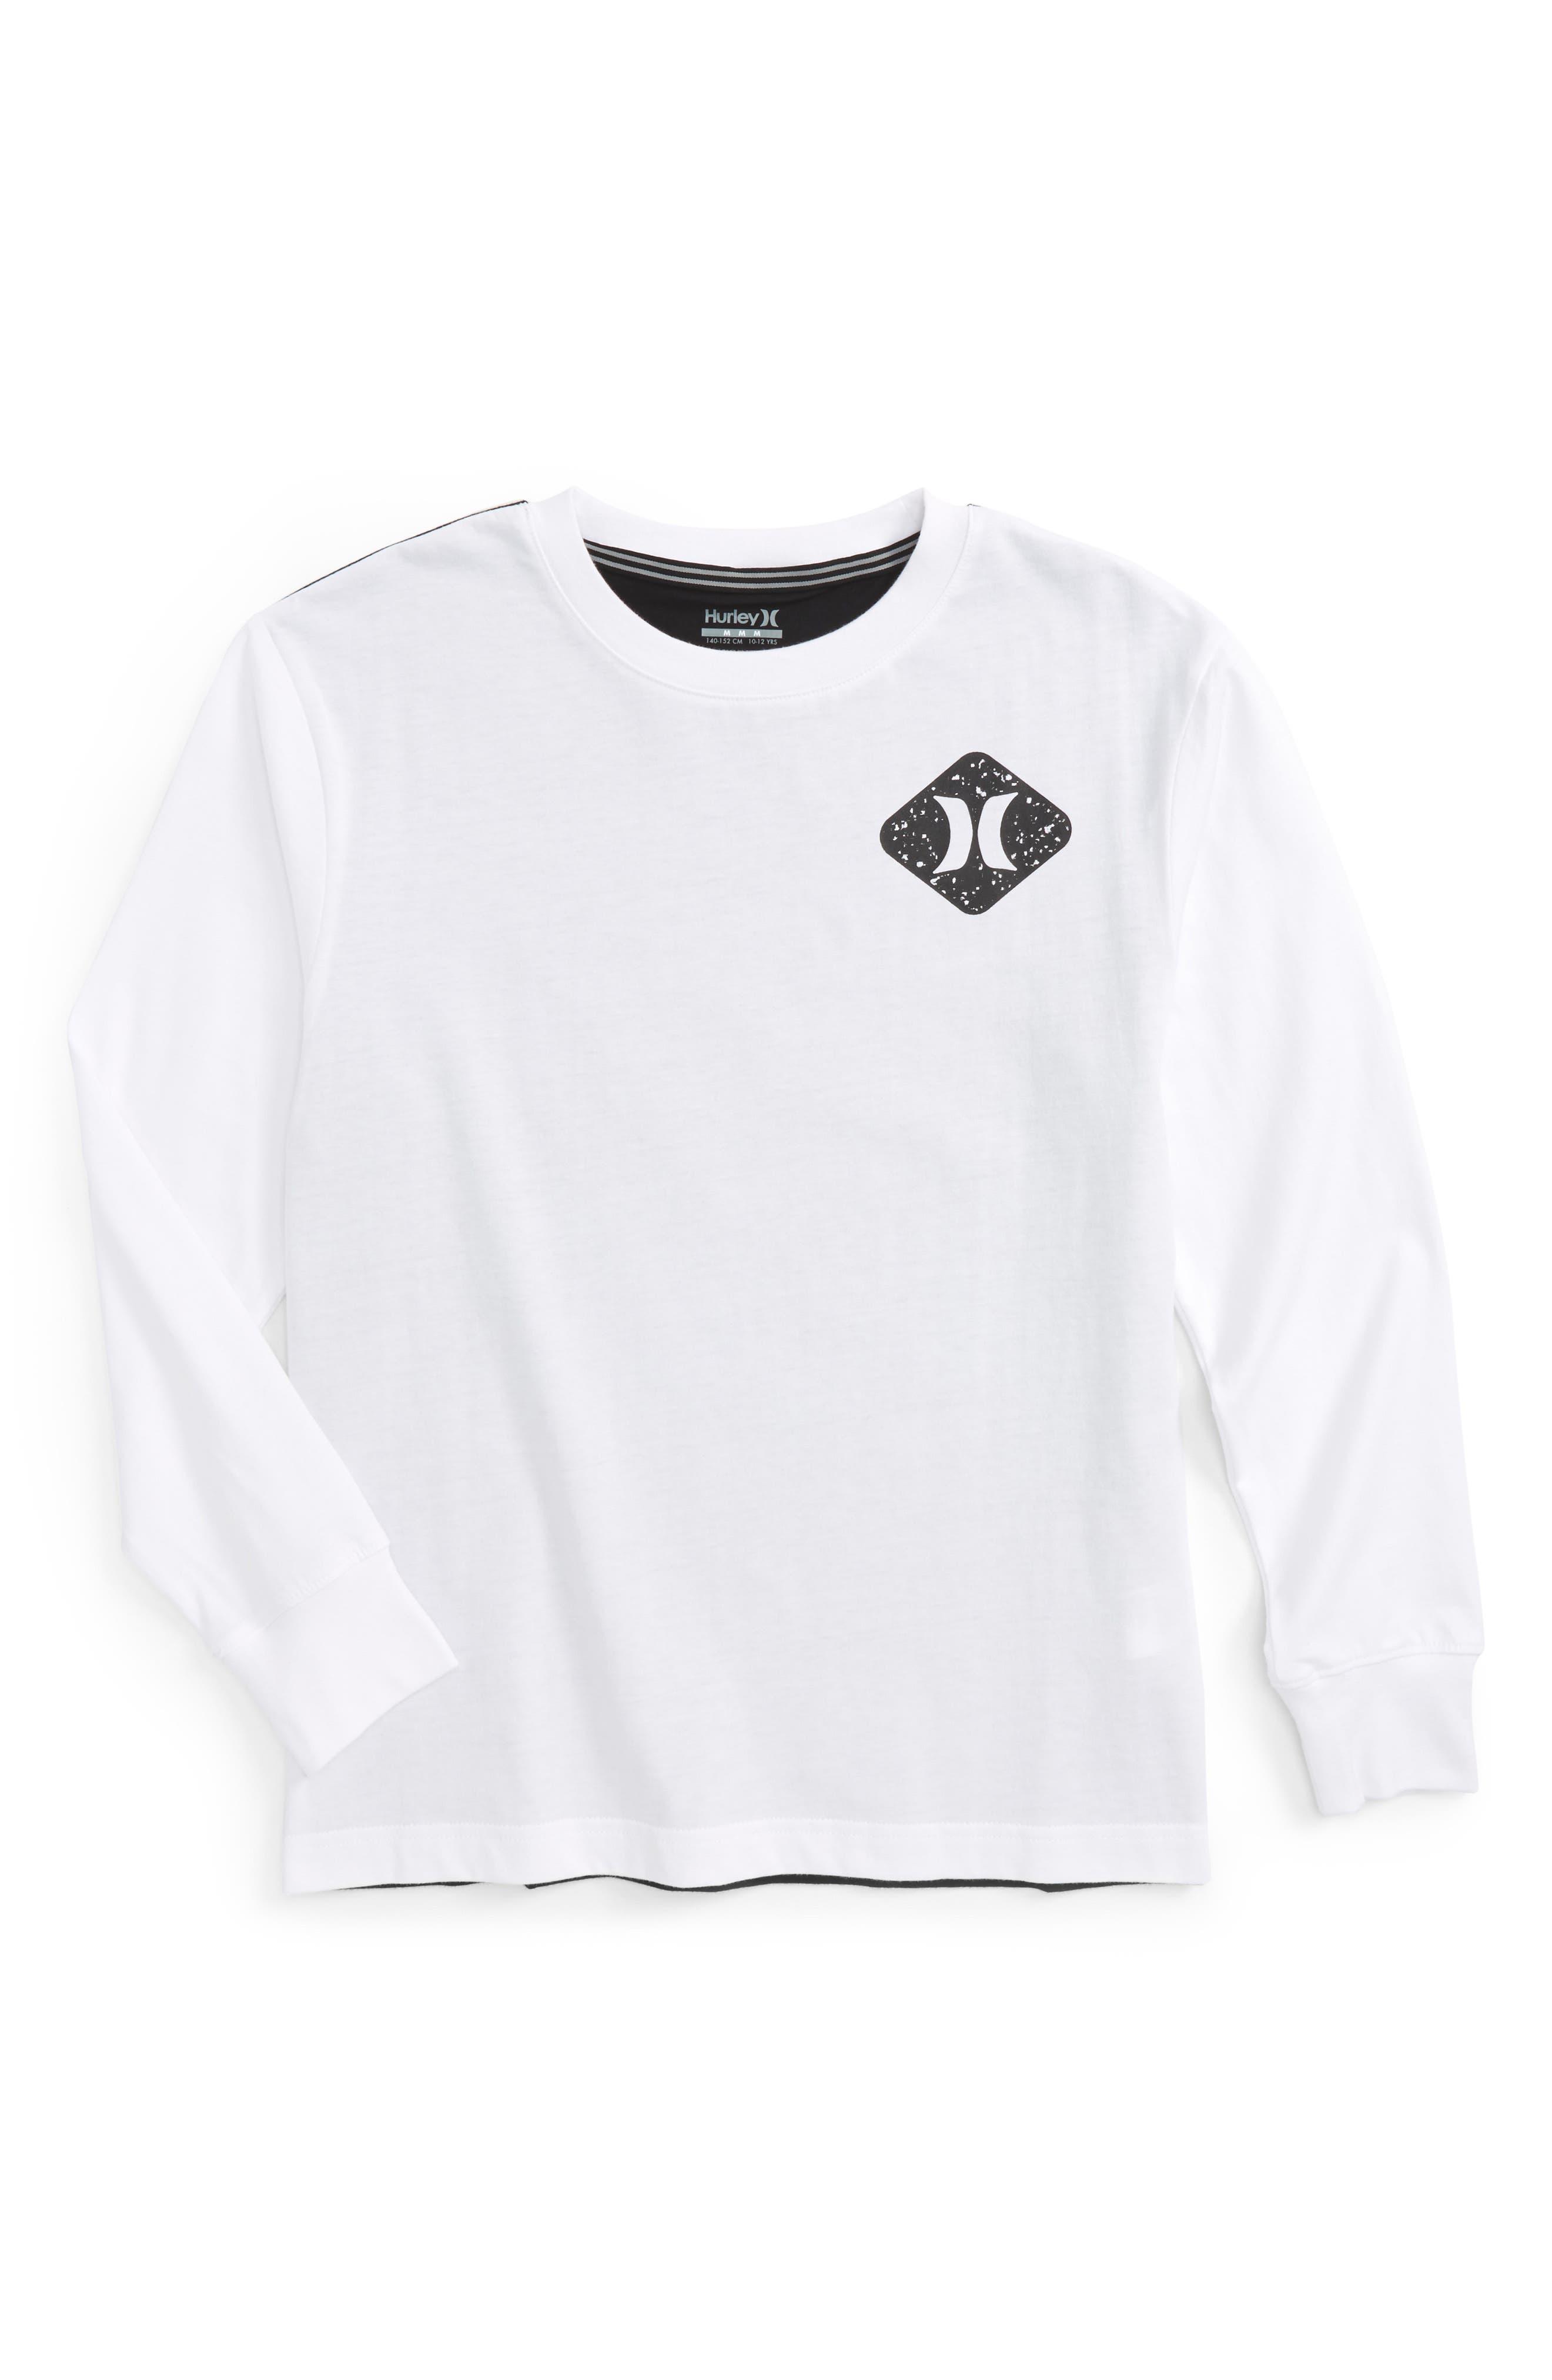 Alternate Image 1 Selected - Hurley Colorblocked Long Sleeve Logo T-Shirt (Big Boys)